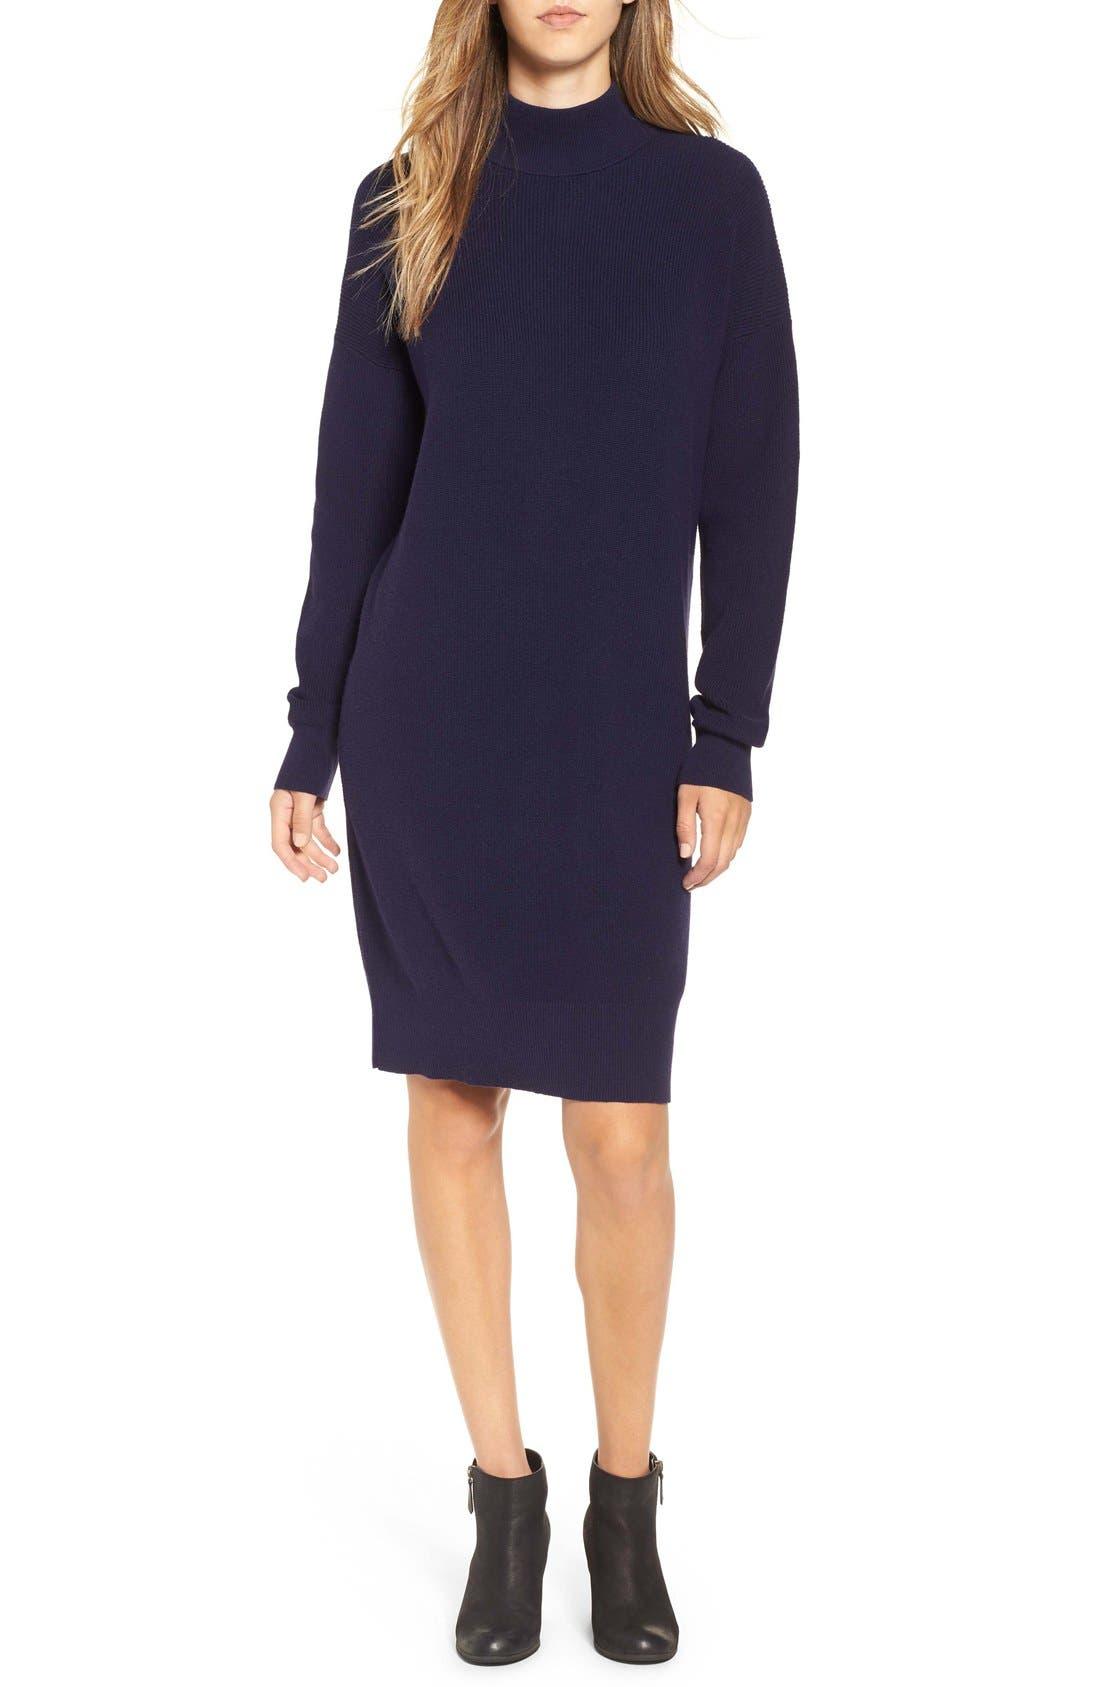 Alternate Image 1 Selected - BP. Mock Neck Knit Sweater Dress